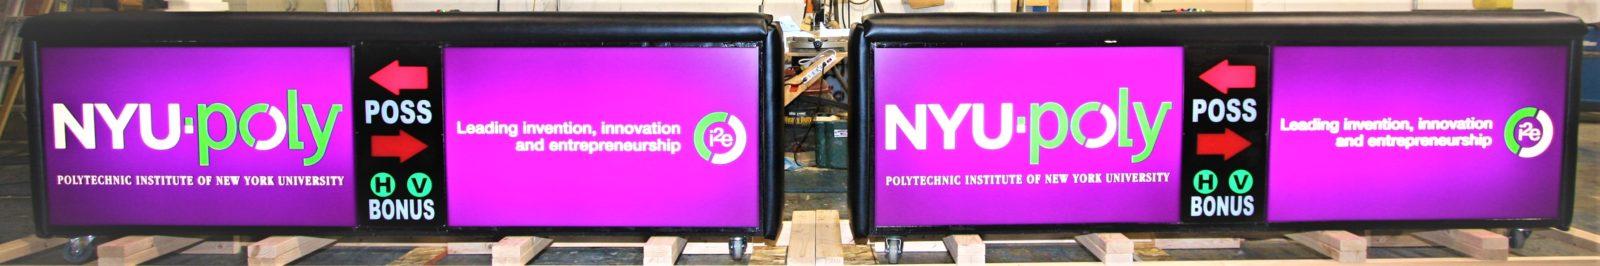 NYU Poly Freestand Scoring Tables